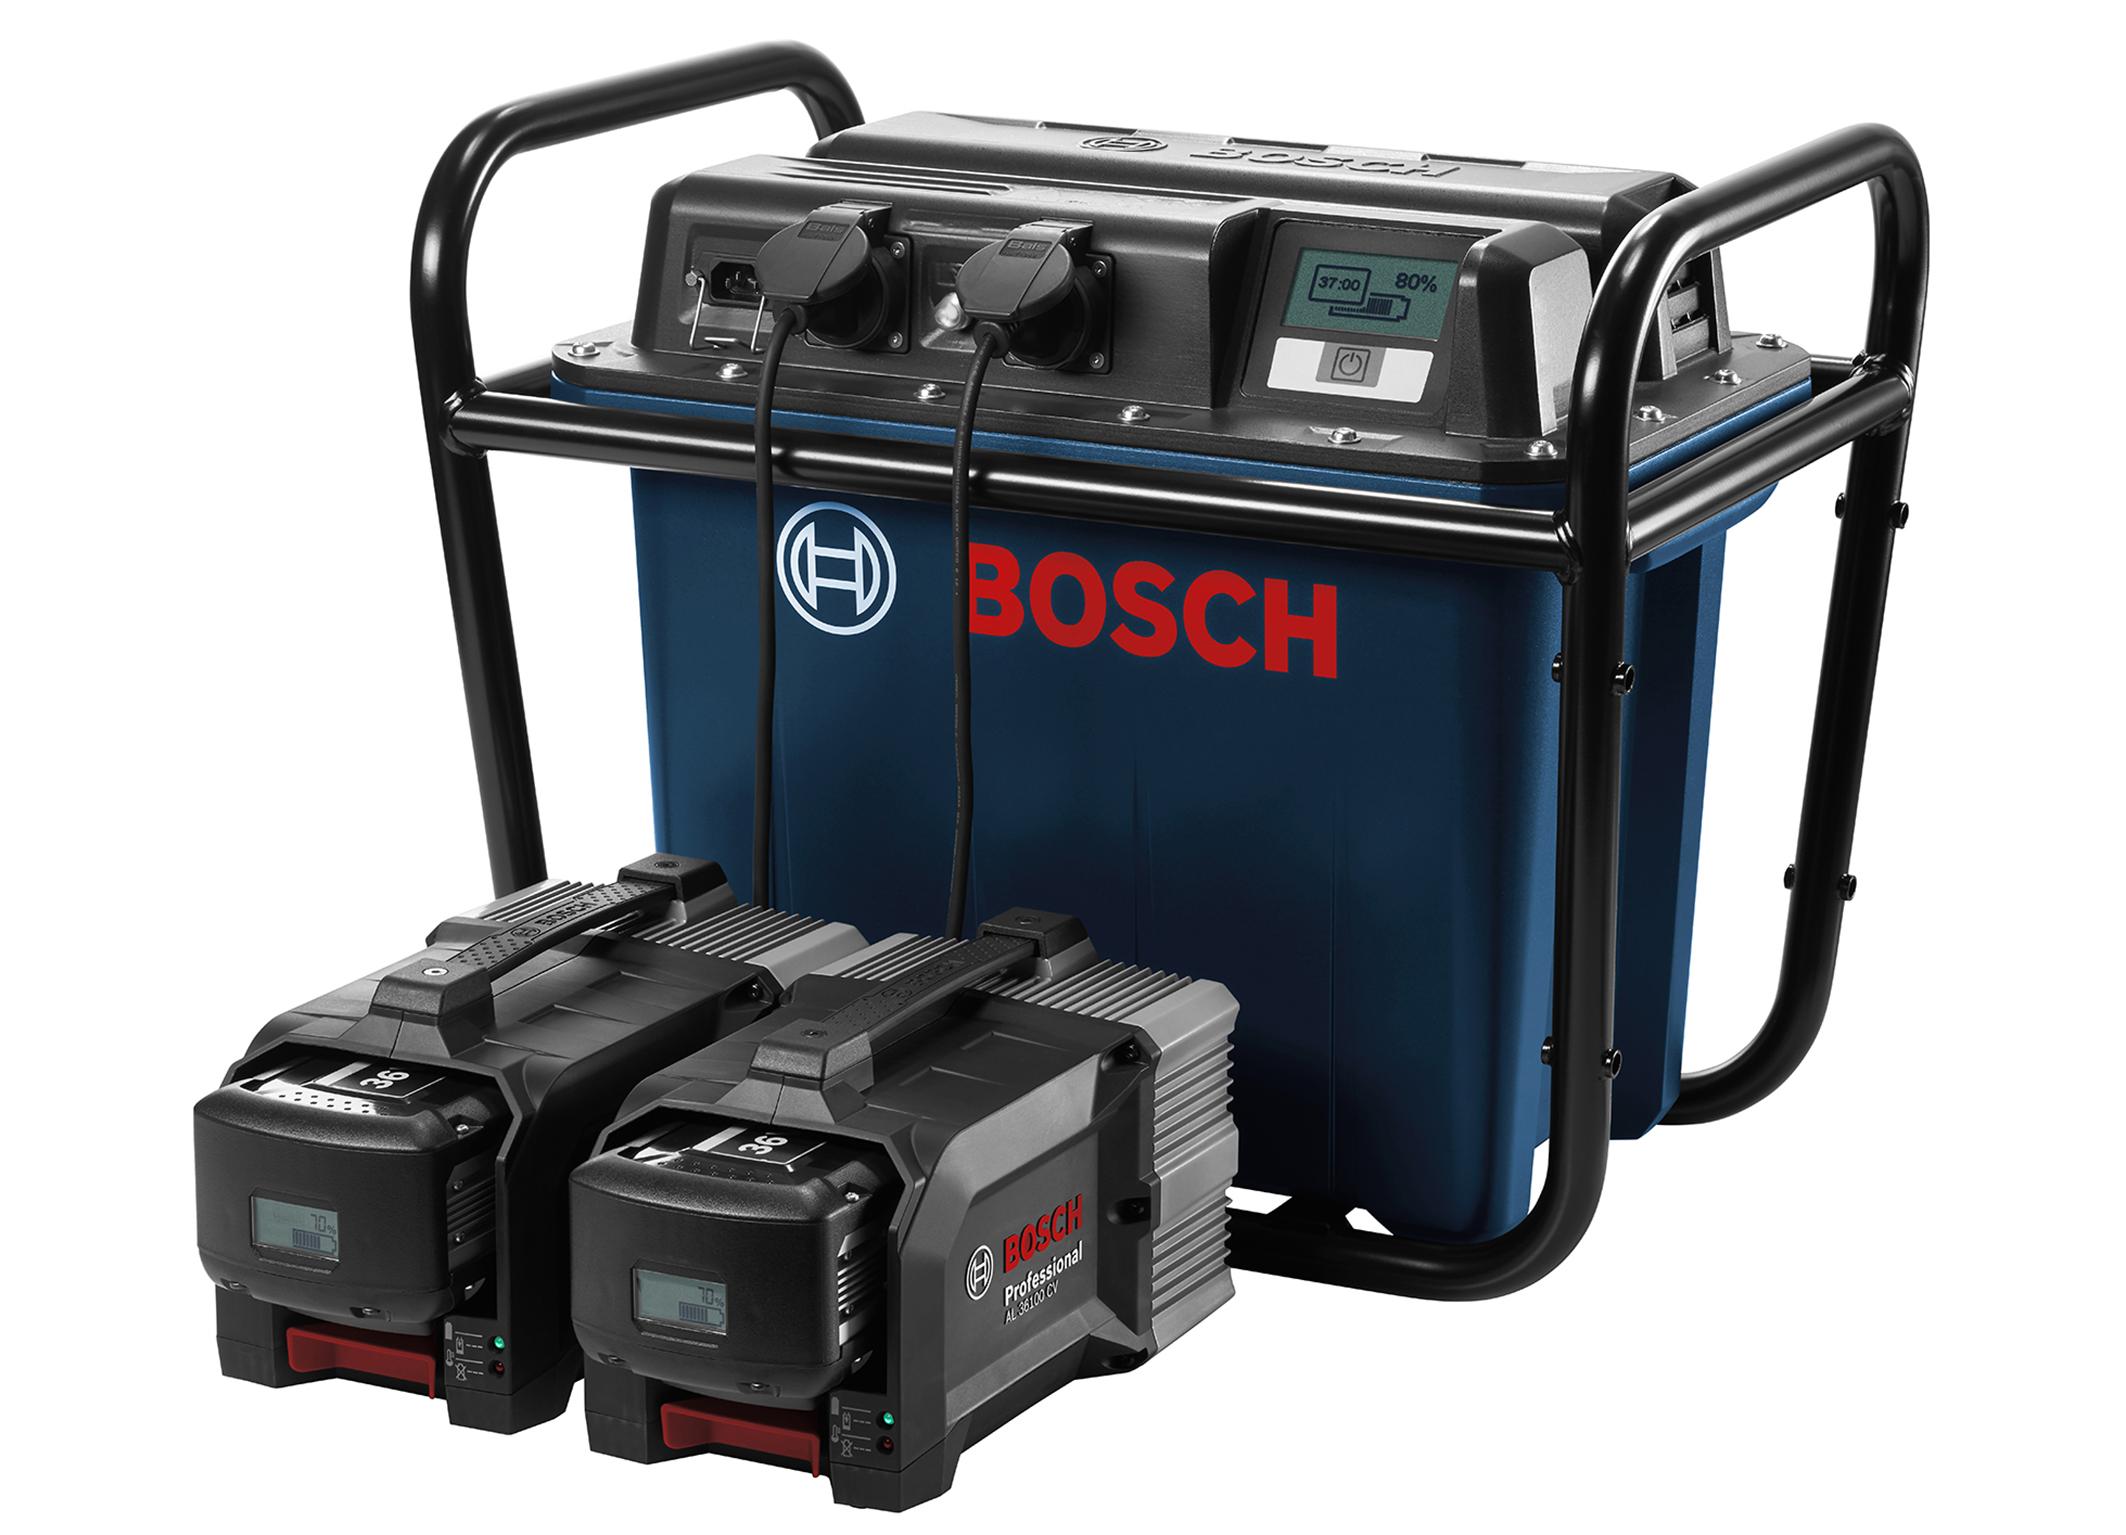 bosch extends its range of professional garden tools bosch media service. Black Bedroom Furniture Sets. Home Design Ideas